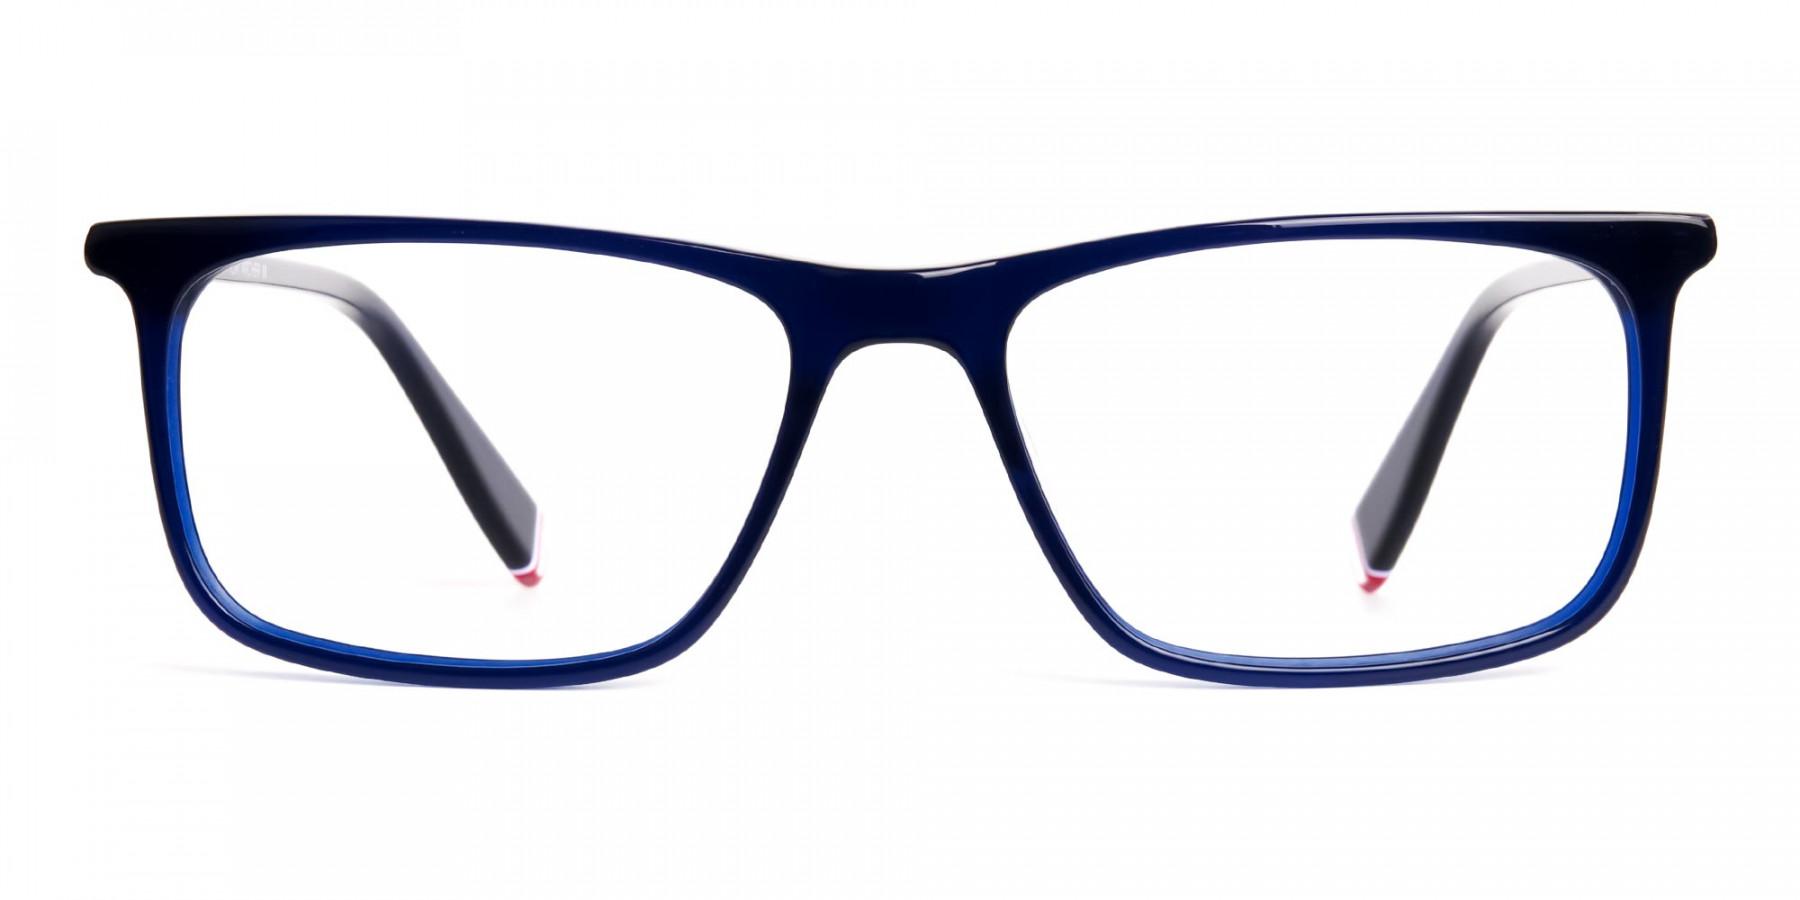 indigo-blue-glasses-rectangular-shape-frames-1